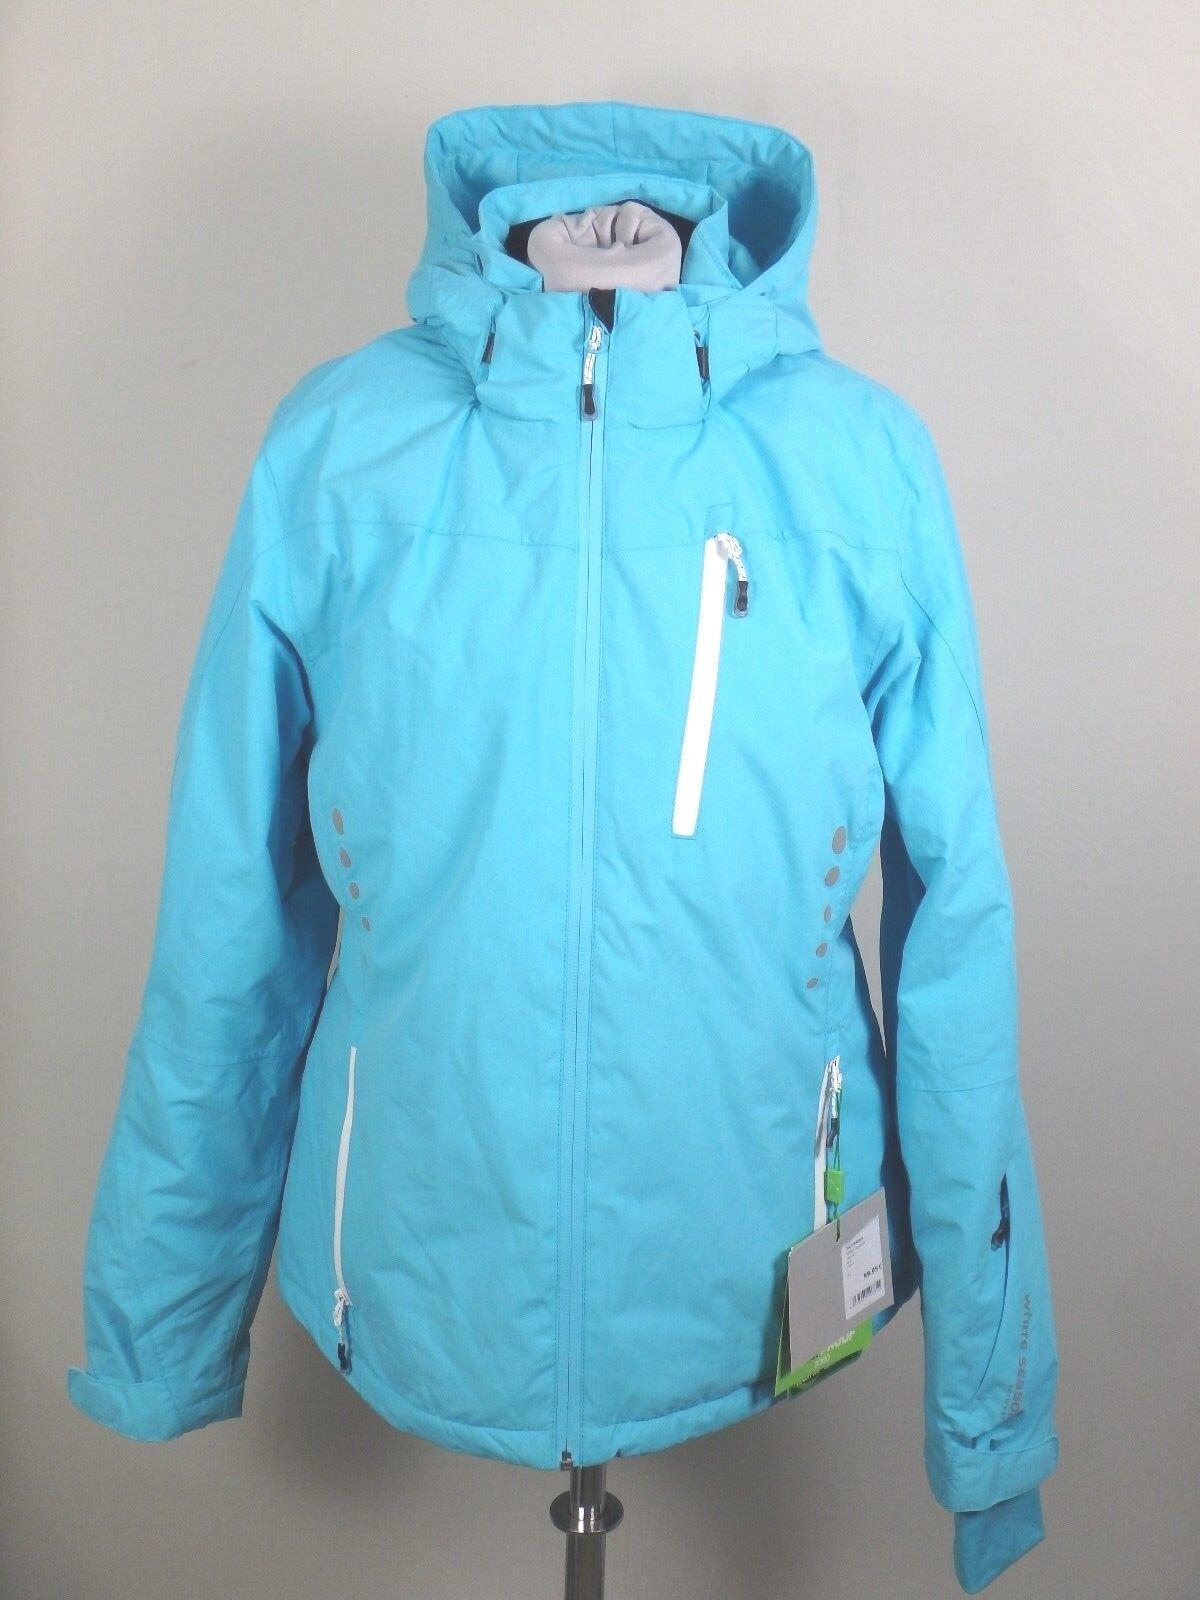 Weiß Weiß Weiß Season  27390 Ski Snowboard Alpin Outdoor Jacke Damen Gr. 42 Hellblau 6c4055